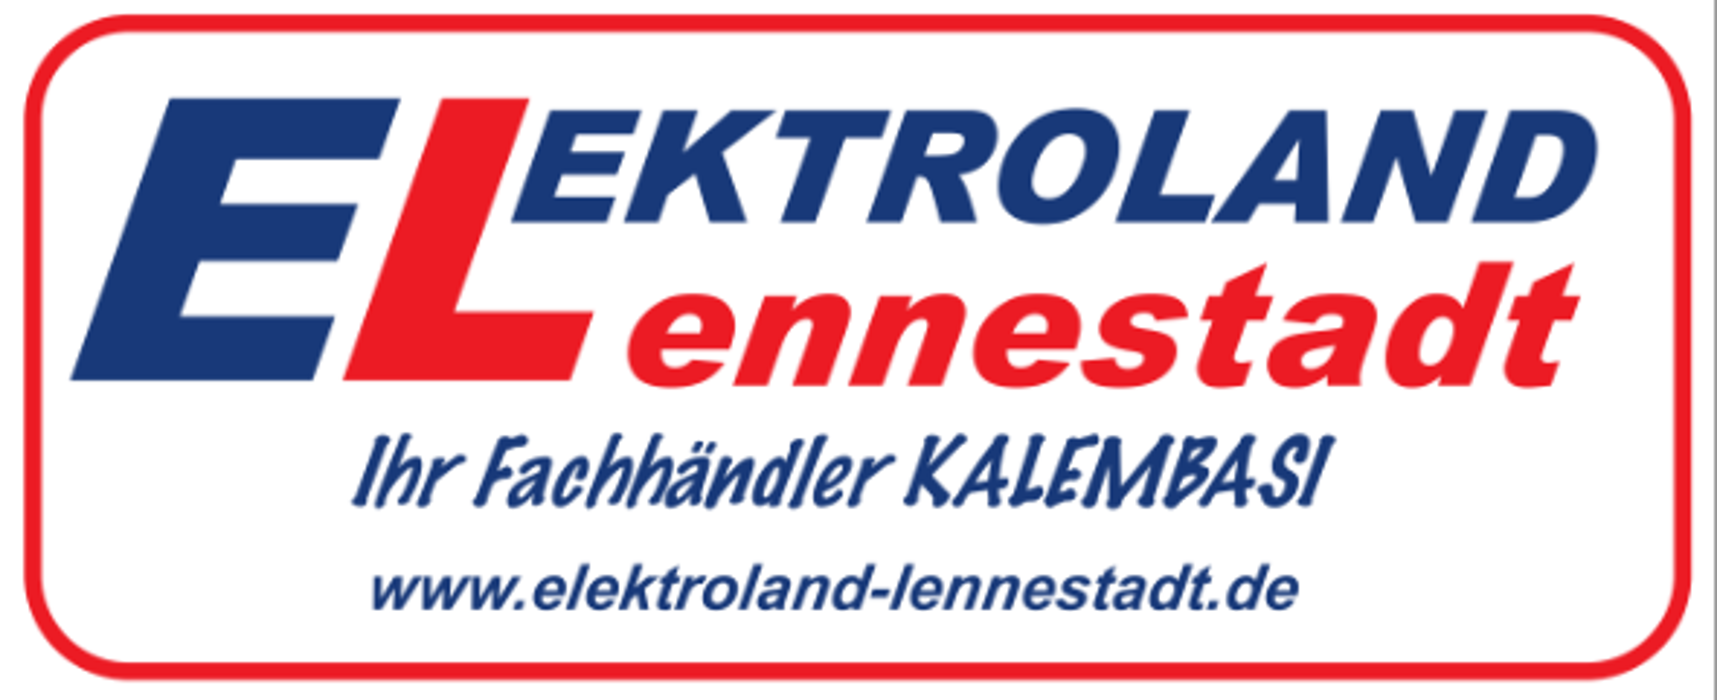 Bild zu Elektroland Lennestadt NK Elektrohandel GmbH in Lennestadt